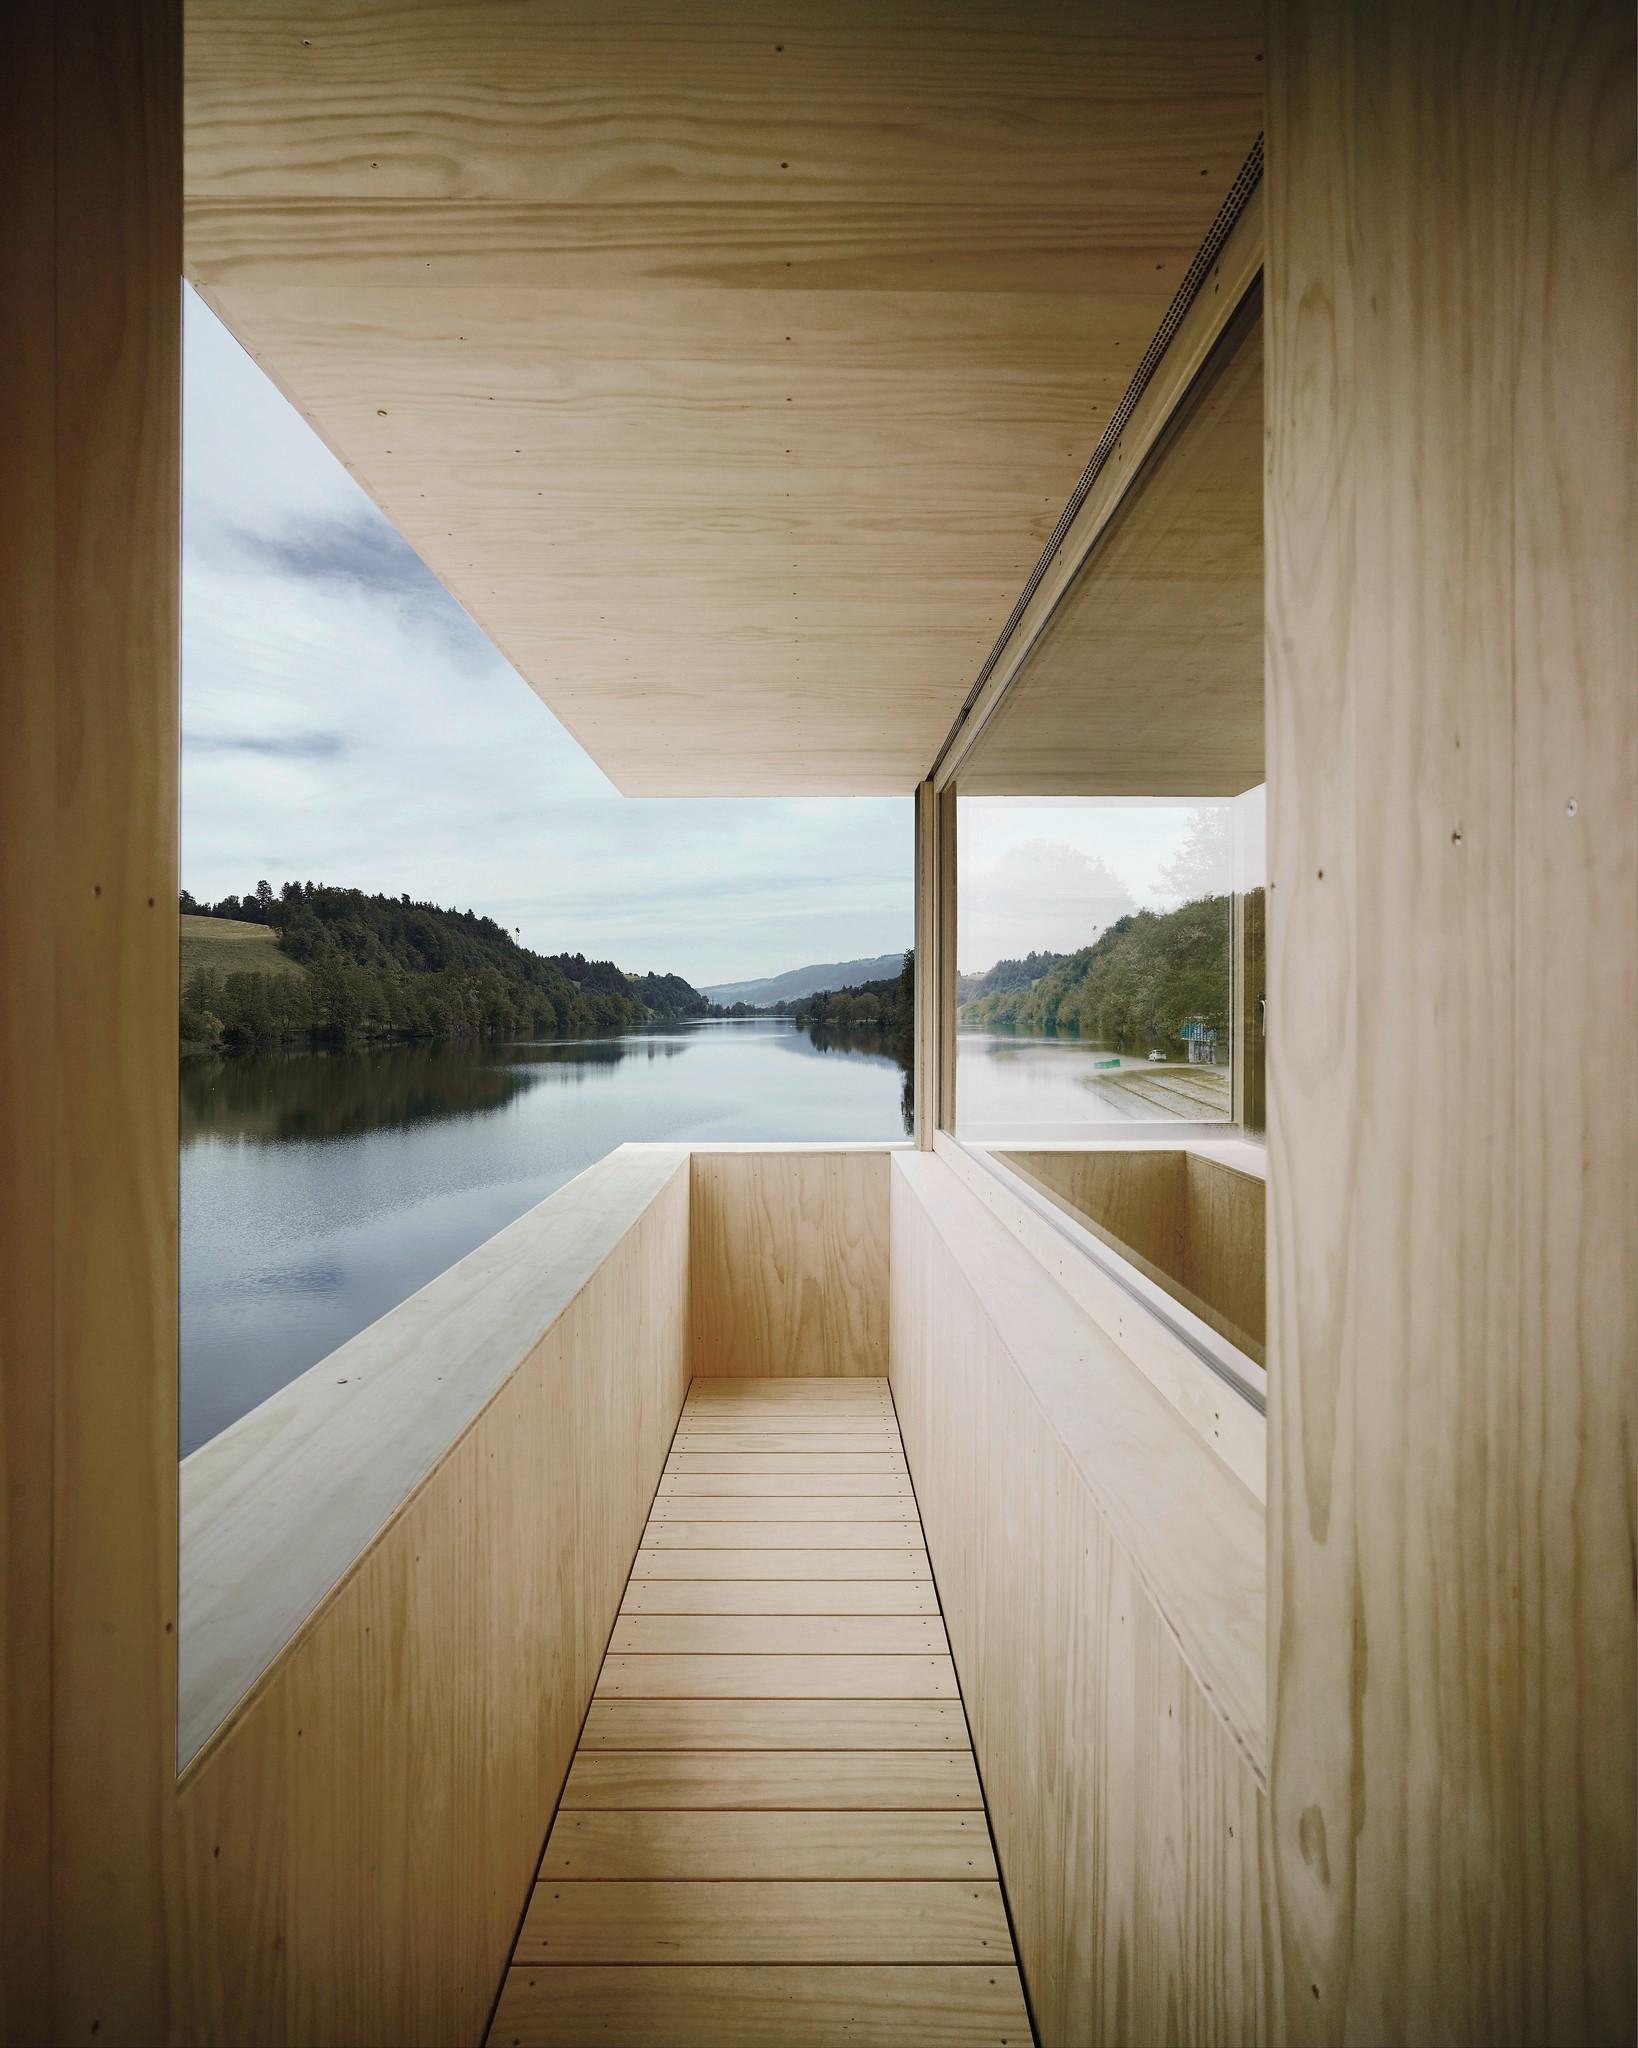 AFGH Architekten's Lake Rotsee Refuge. Architects: Andreas Fuhrimann, Gabrielle Hächler. Photo credit © Valentin Jeck